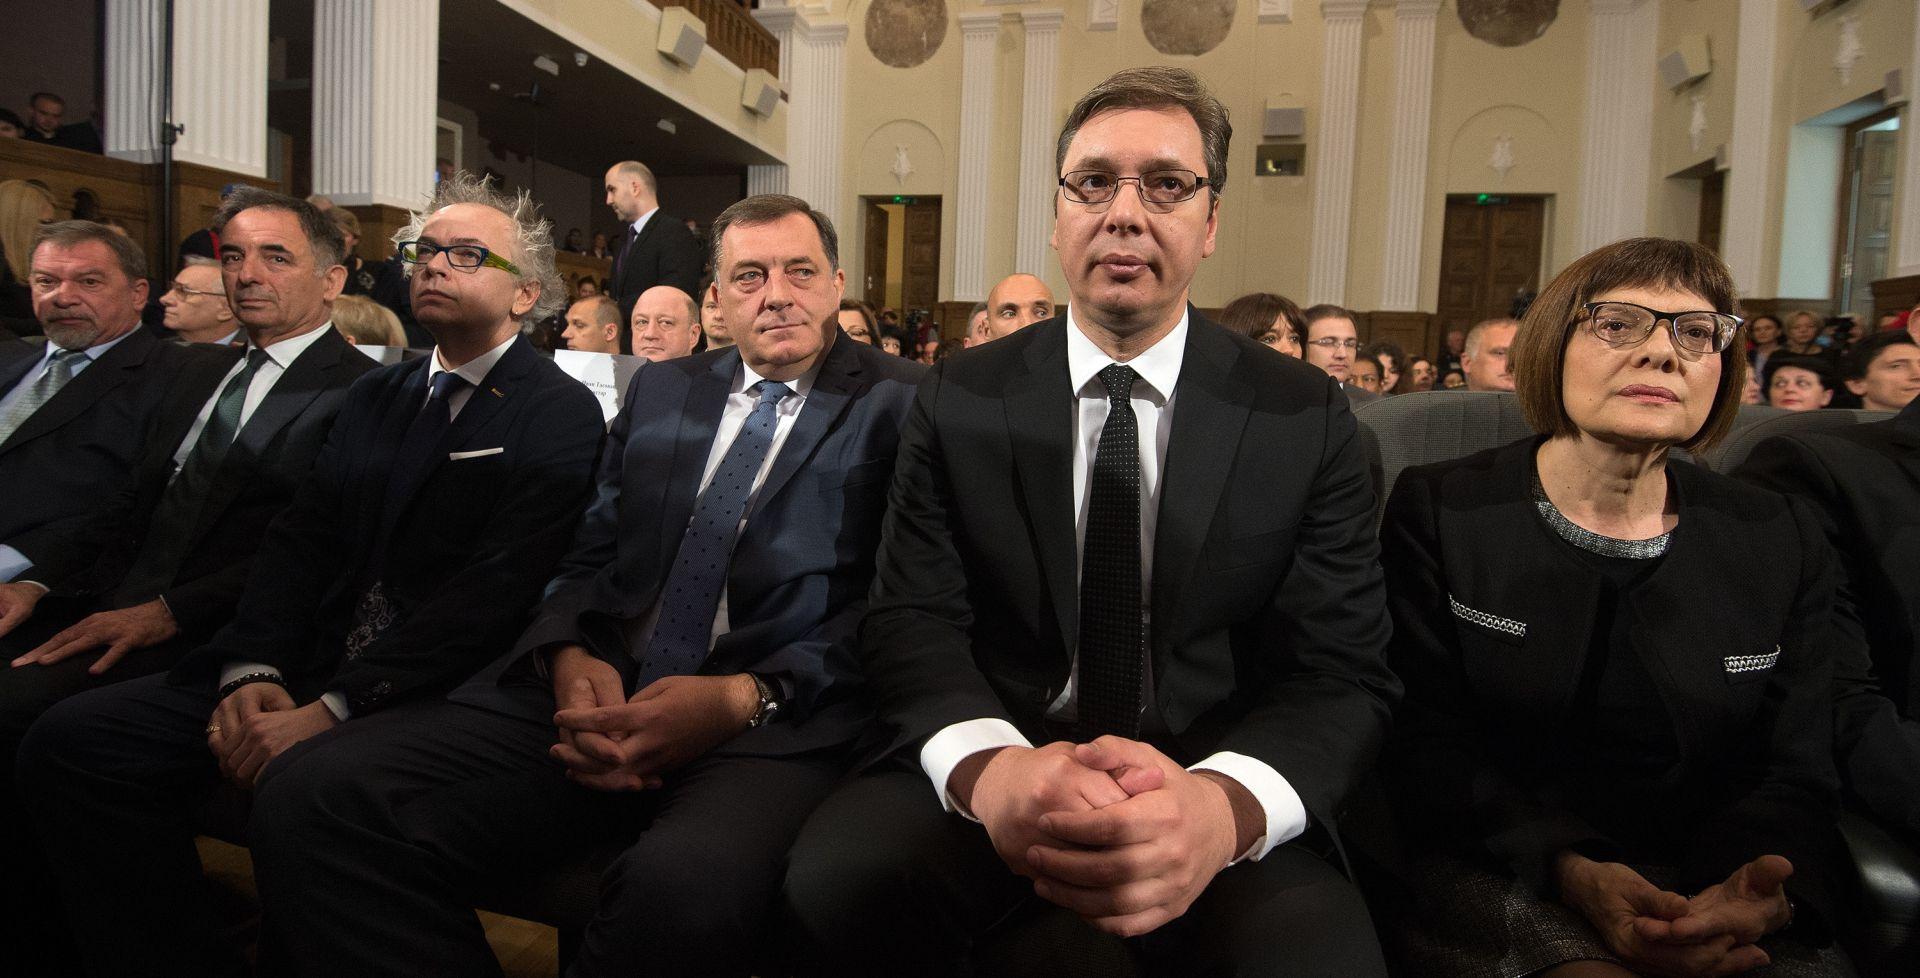 ALEKSANDAR VUČIĆ 'Jasenovac ne zaboraviti, ali ne sanjati osvetu'